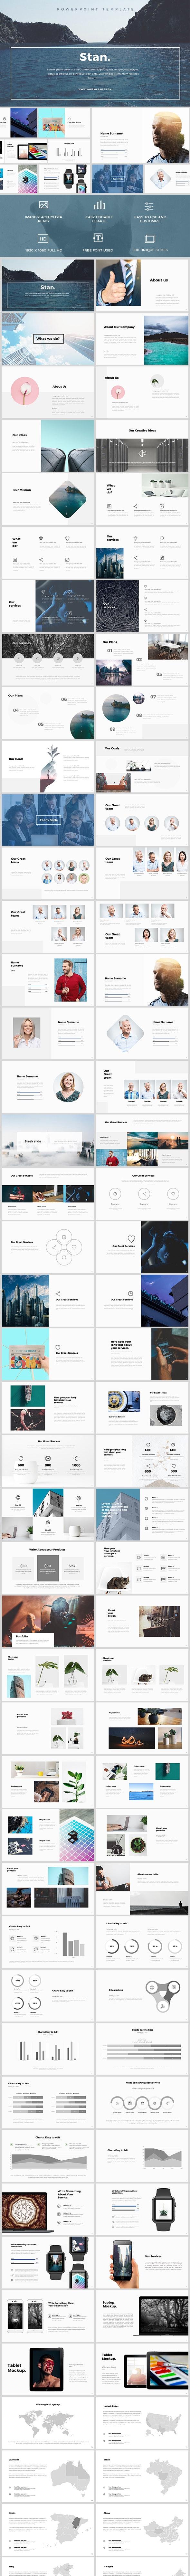 Stan Powerpoint Tempate - PowerPoint Templates Presentation Templates